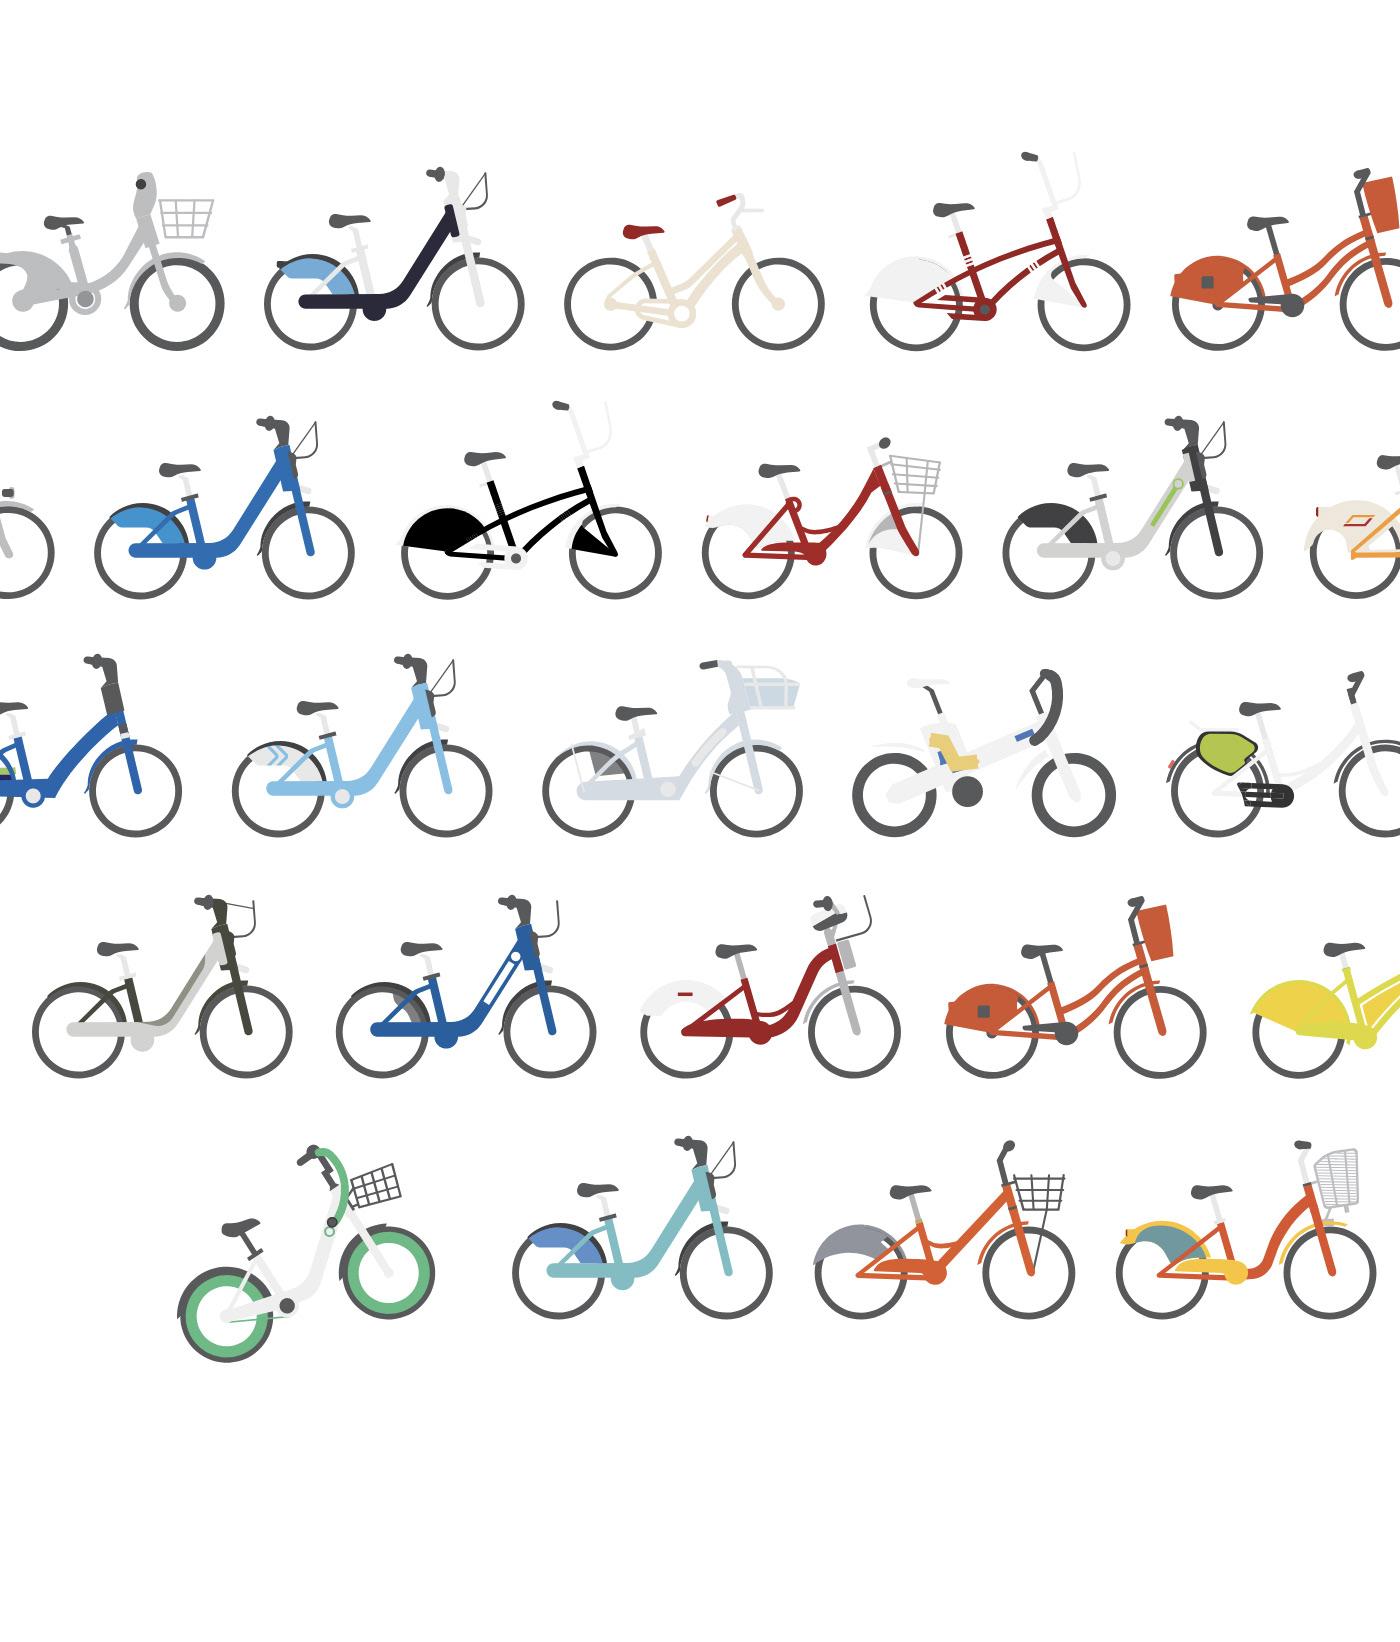 Bicycle bike sharing public bike colorful Cycling ILLUSTRATION  poster Pop Art commuting Big City